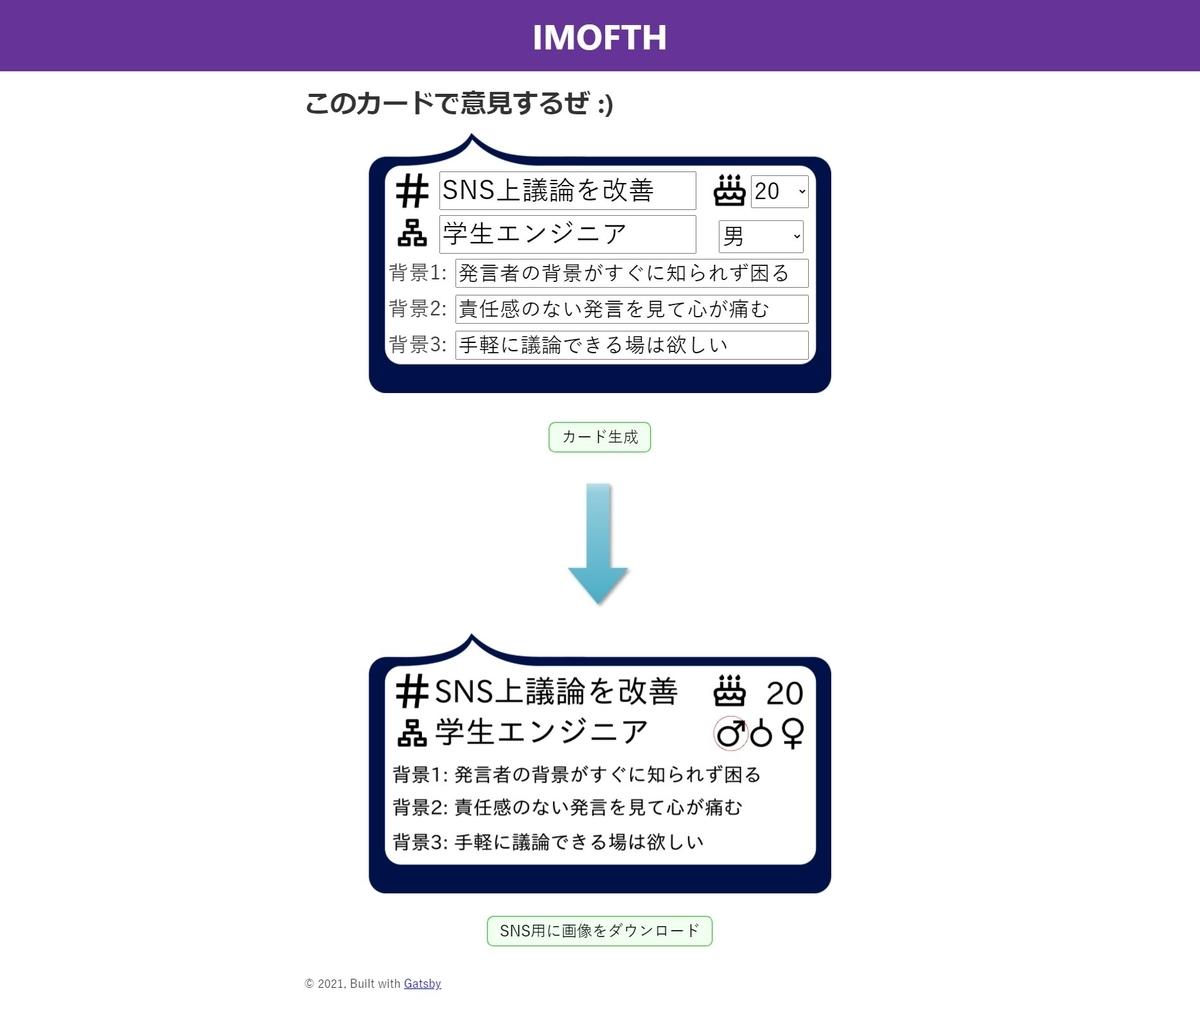 f:id:ume-boshi:20210501062730j:plain